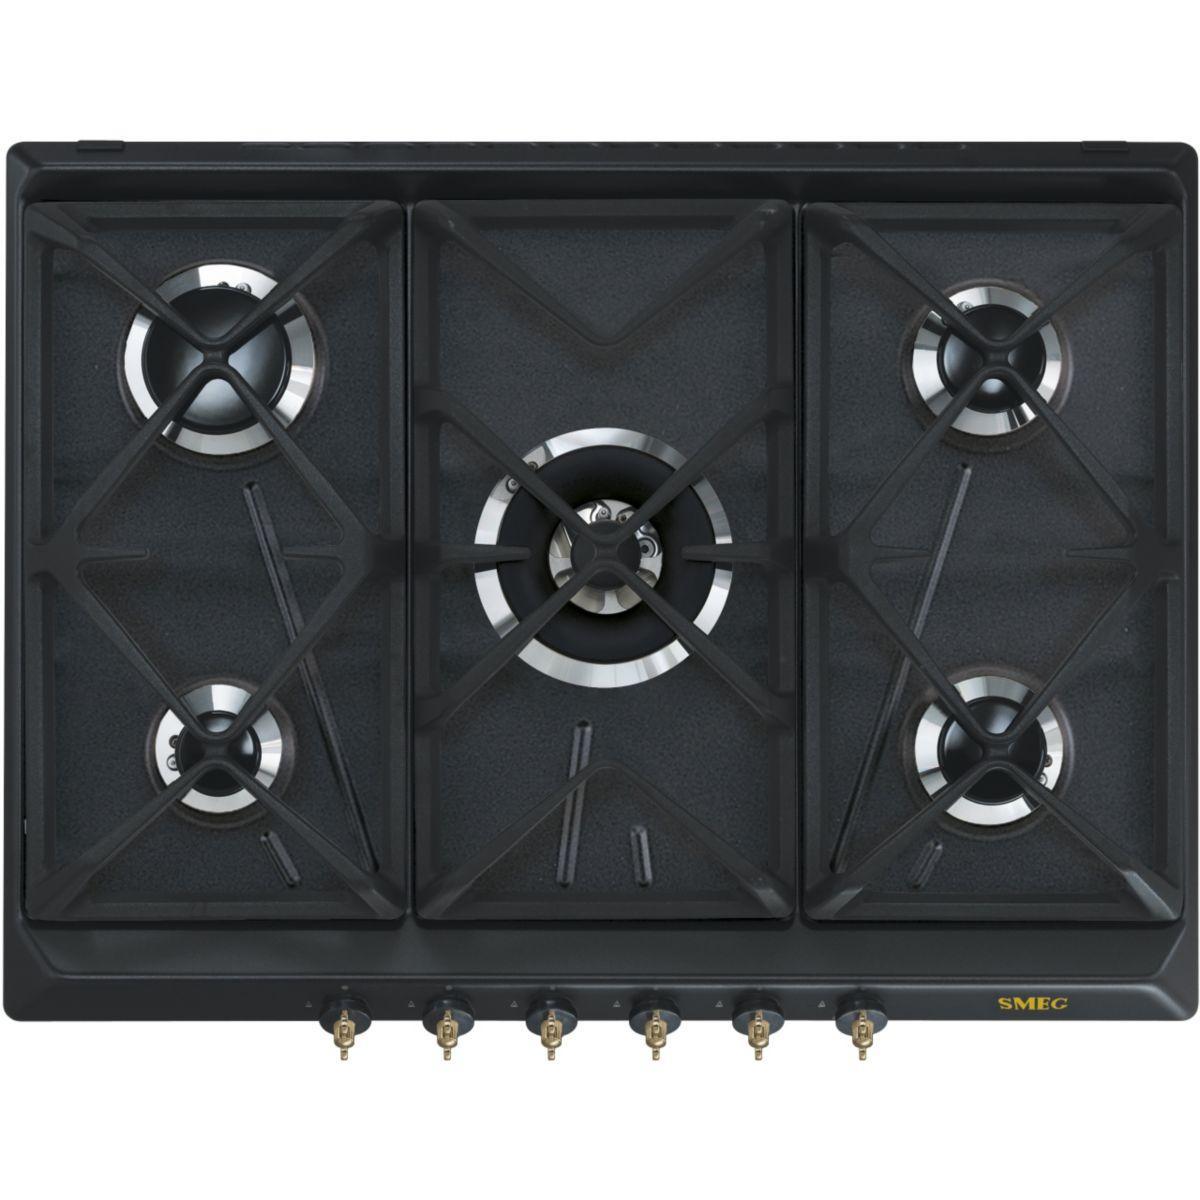 Table de cuisson gaz SMEG SRV876AOGH